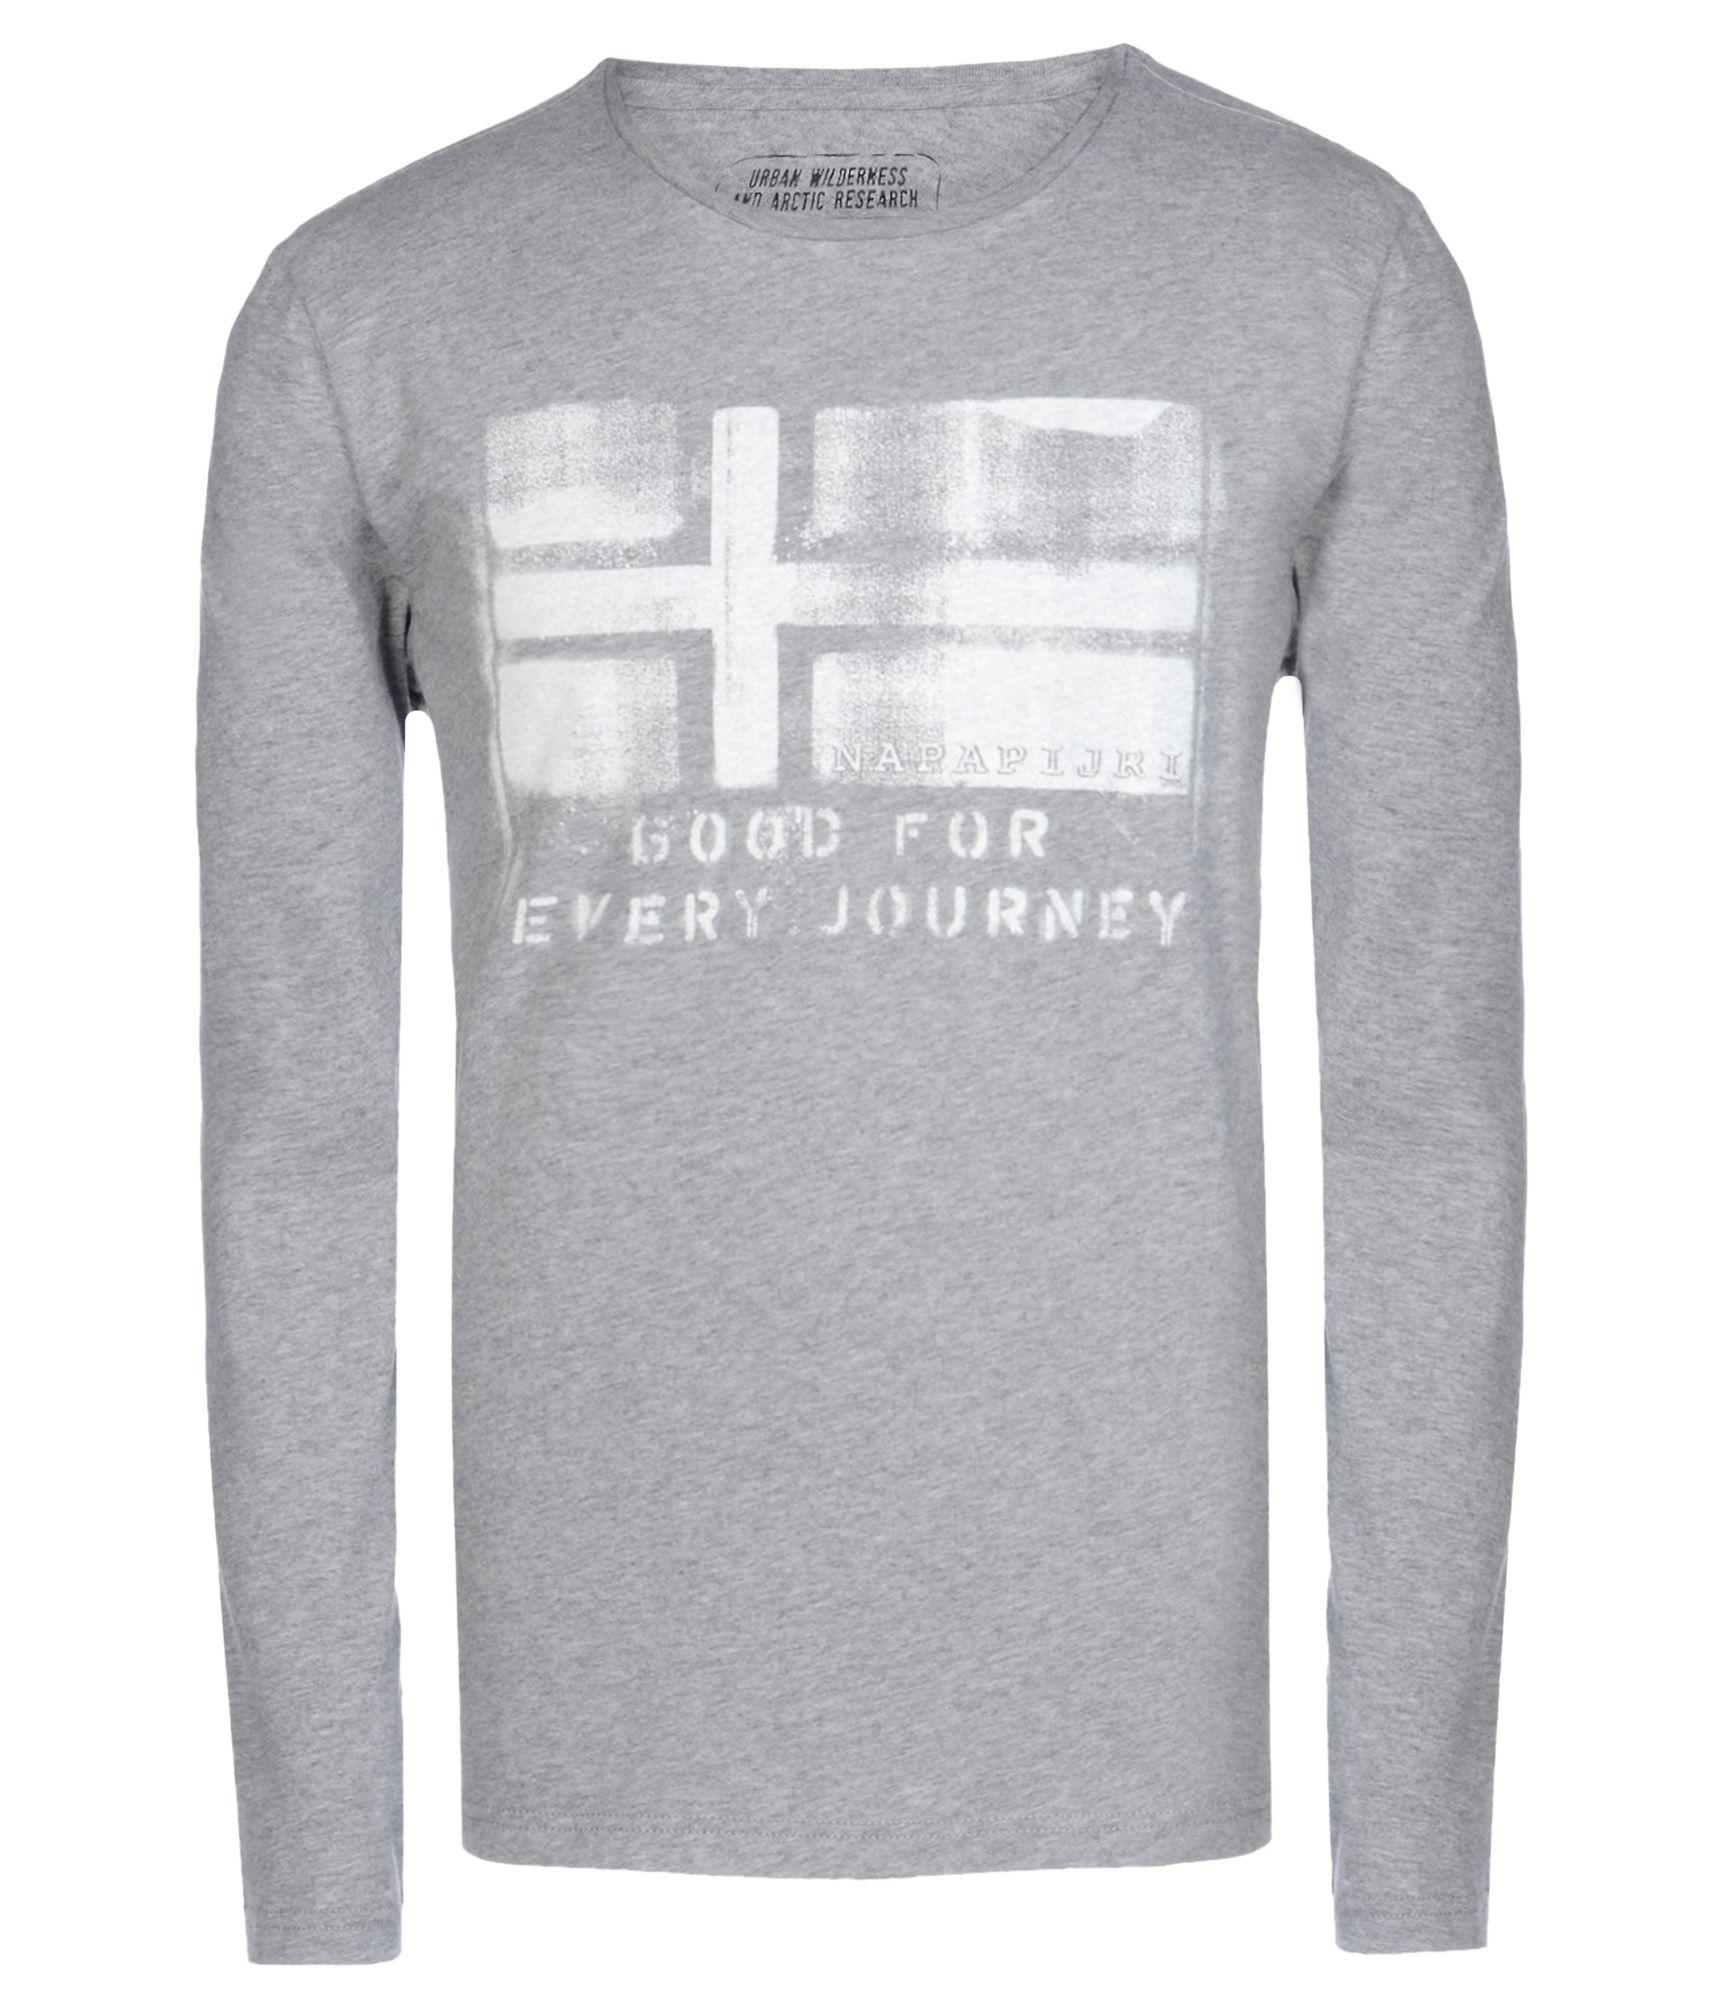 napapijri long sleeve t shirt in gray for men lyst. Black Bedroom Furniture Sets. Home Design Ideas